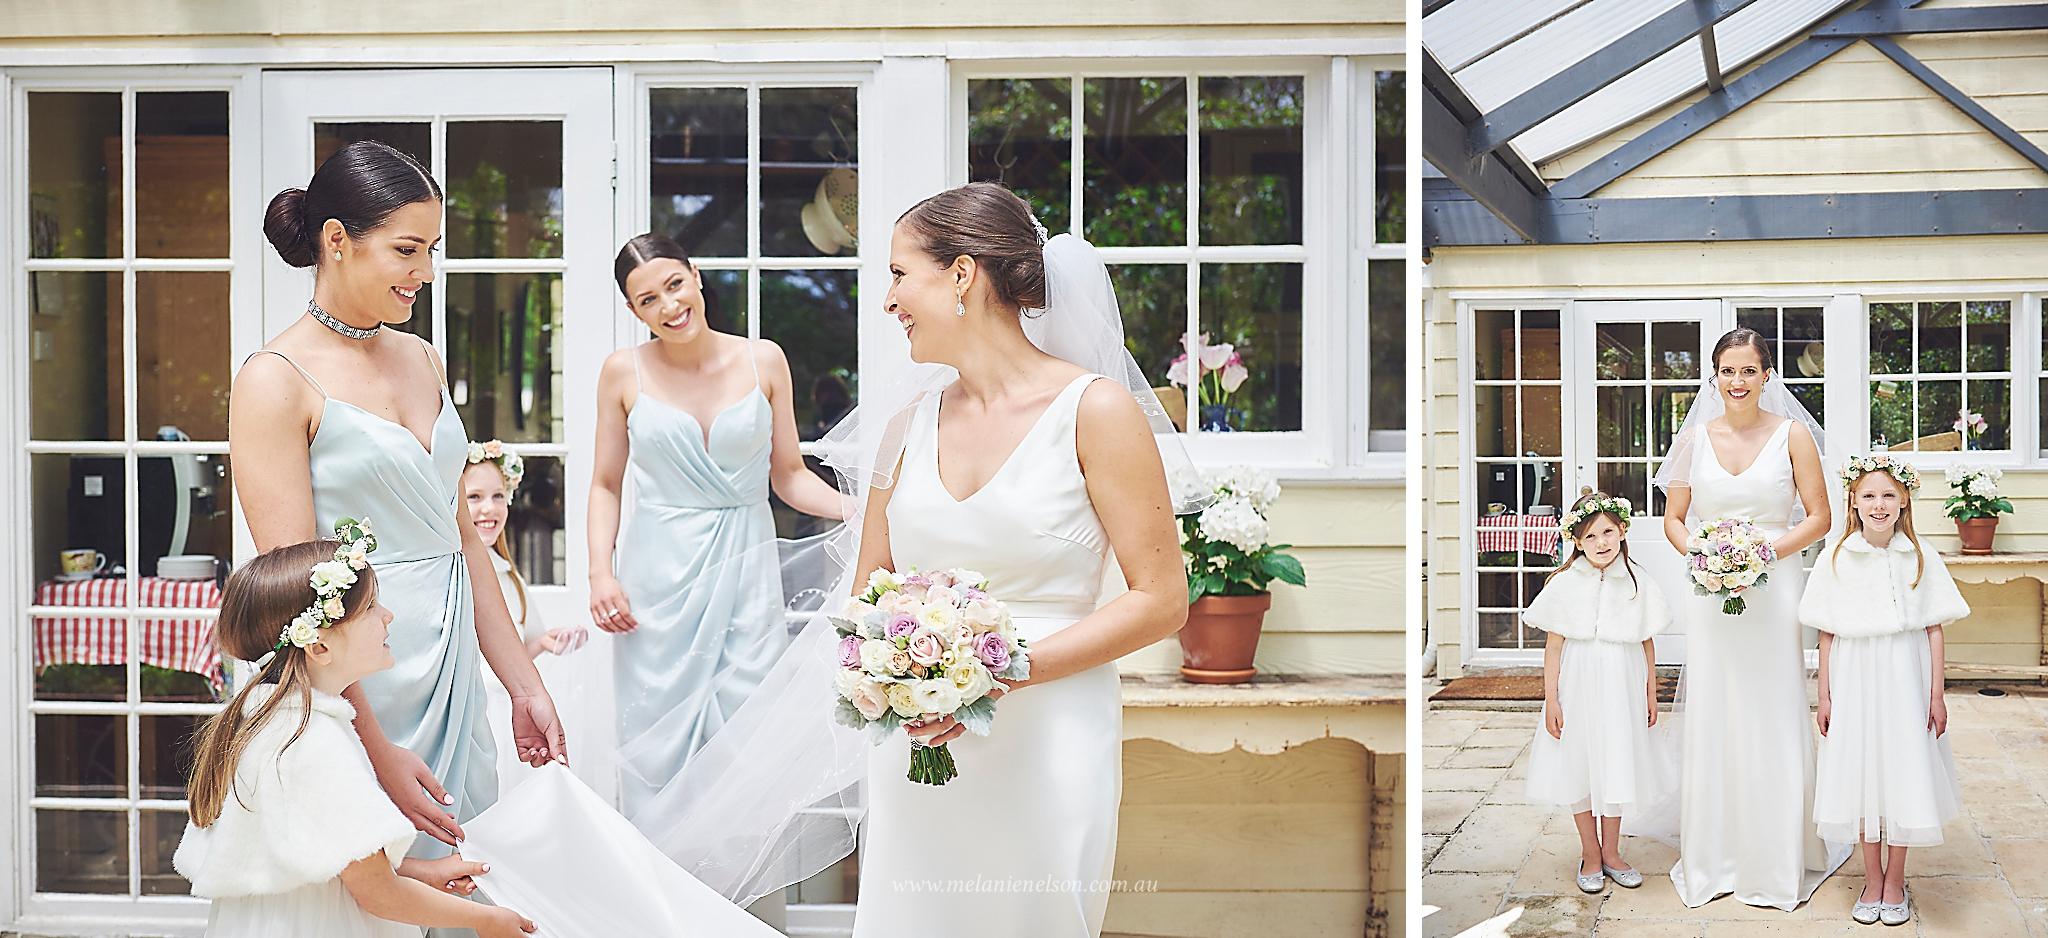 mount_lofty_wedding_0020.jpg